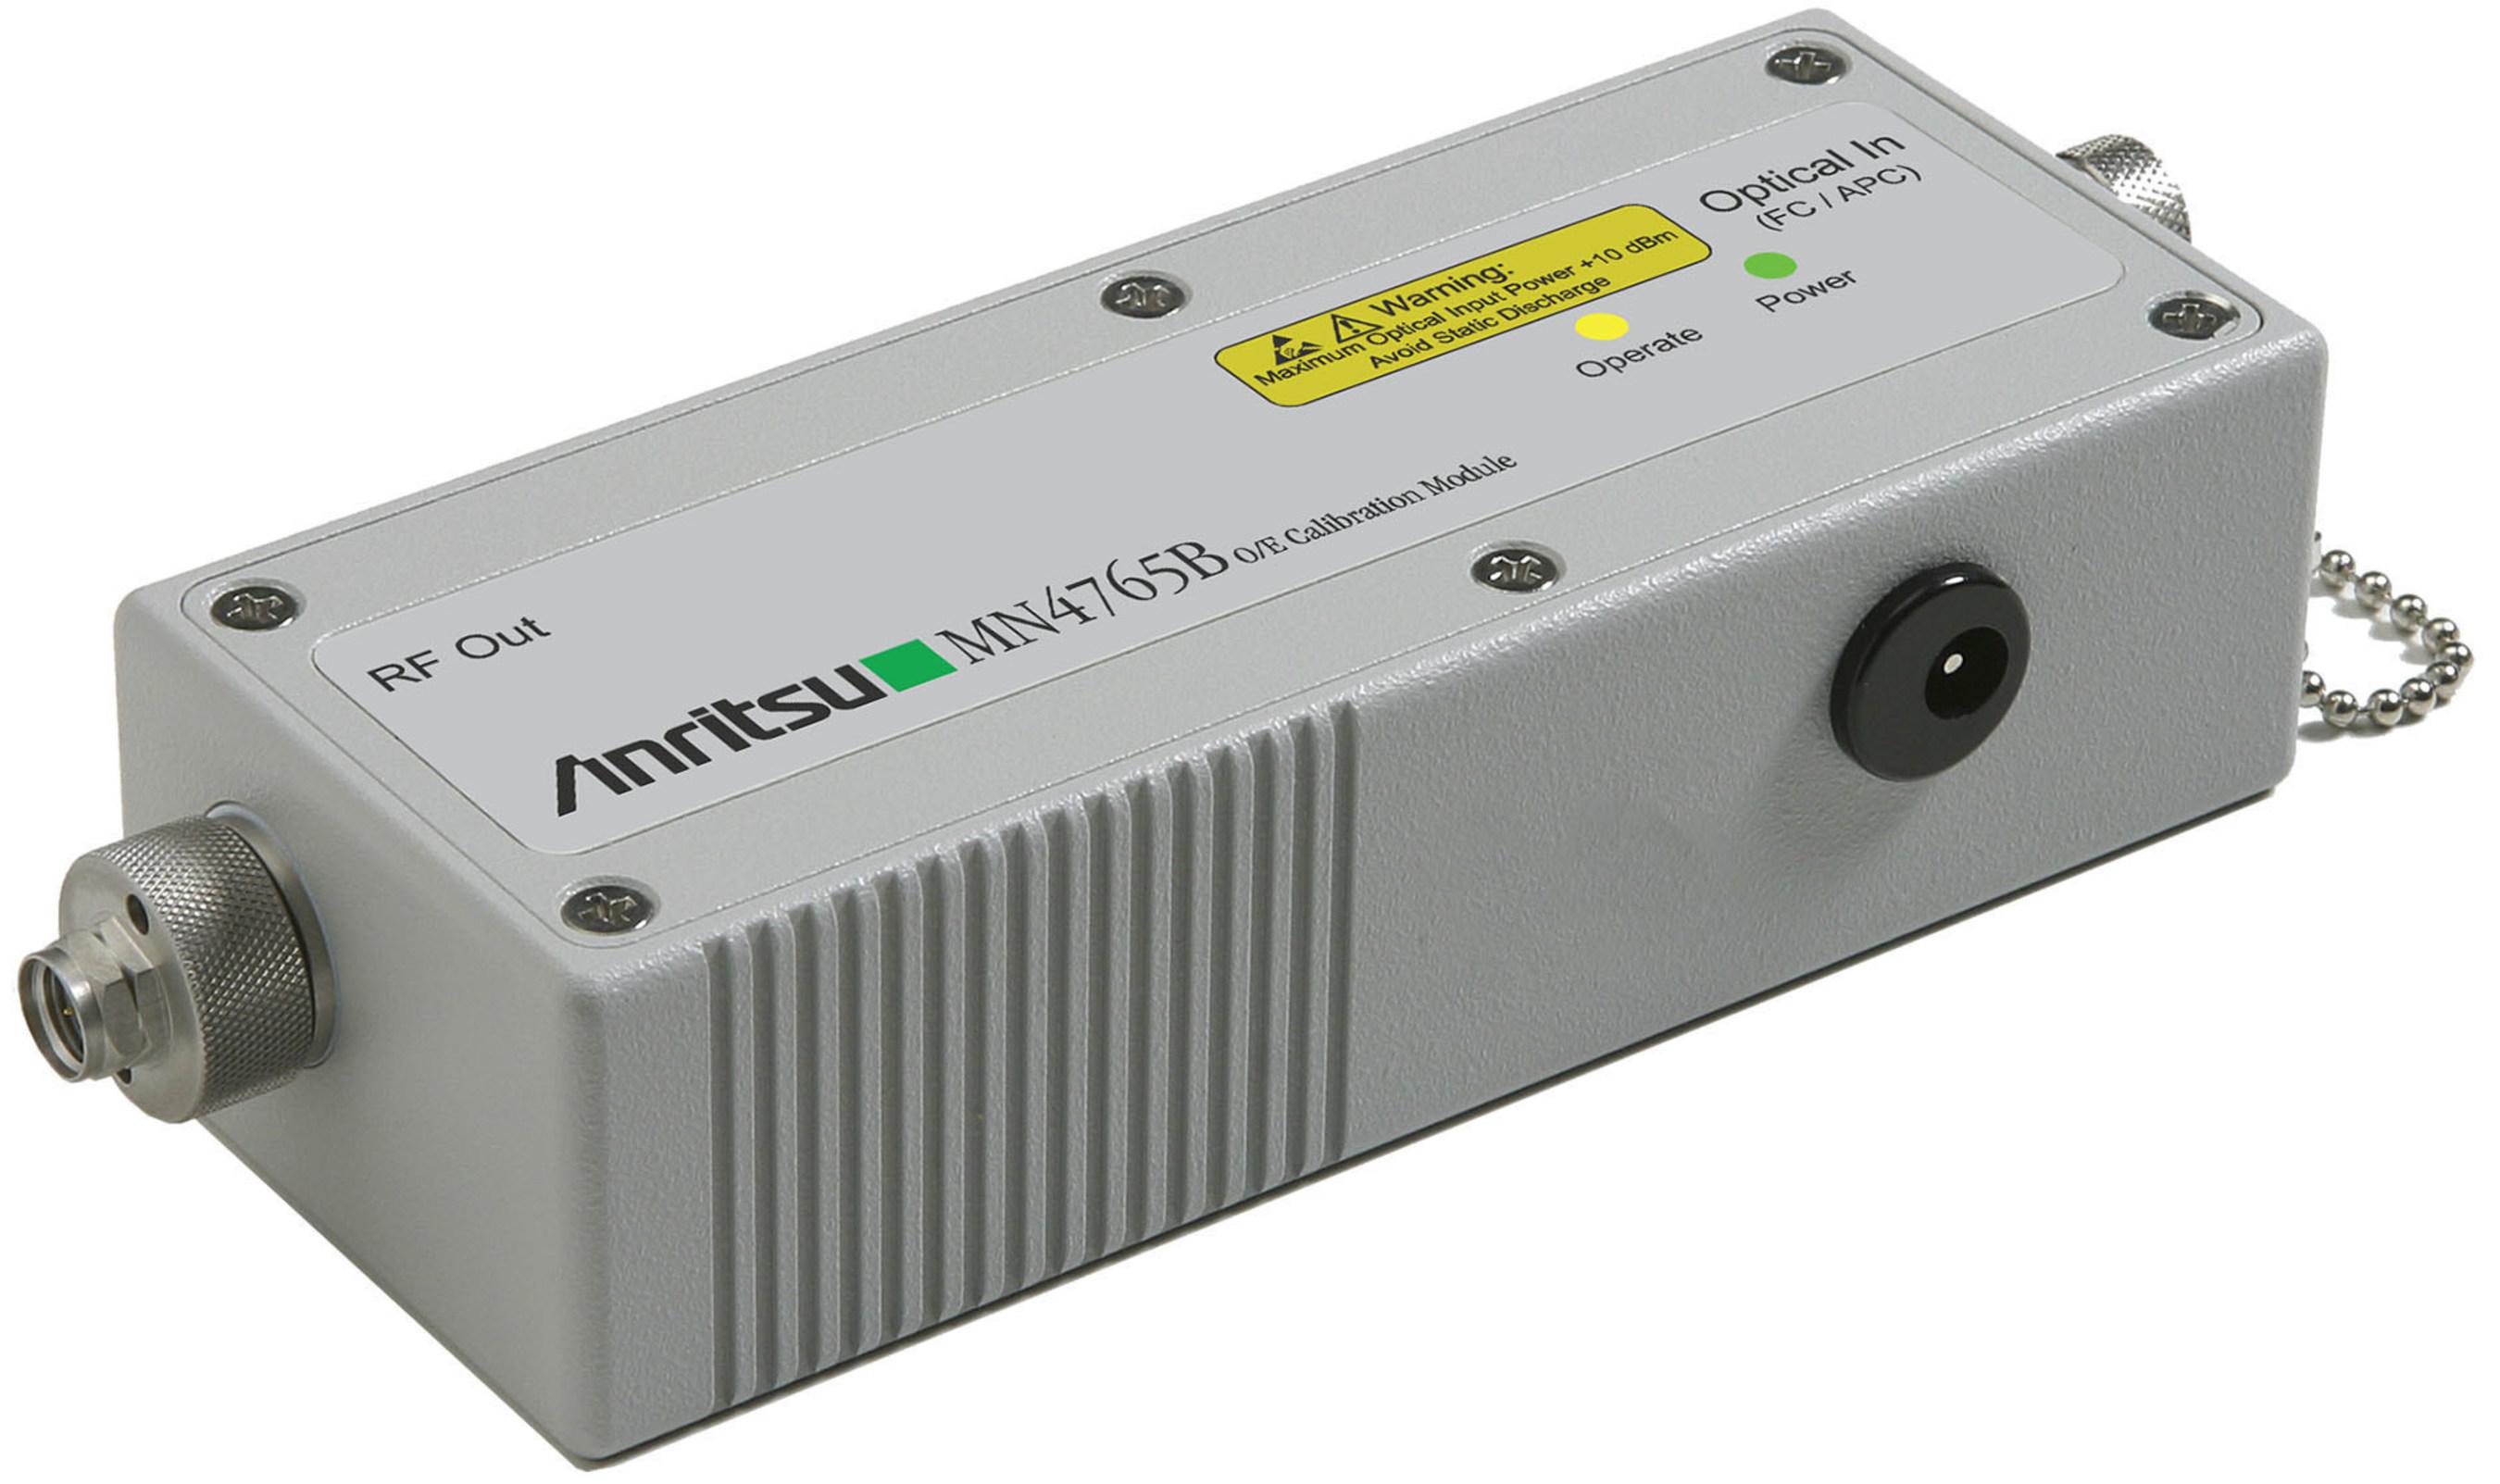 Anritsu Adds Dual Wavelength Measurement Capability to O/E Calibration Modules for VectorStar' VNA Family